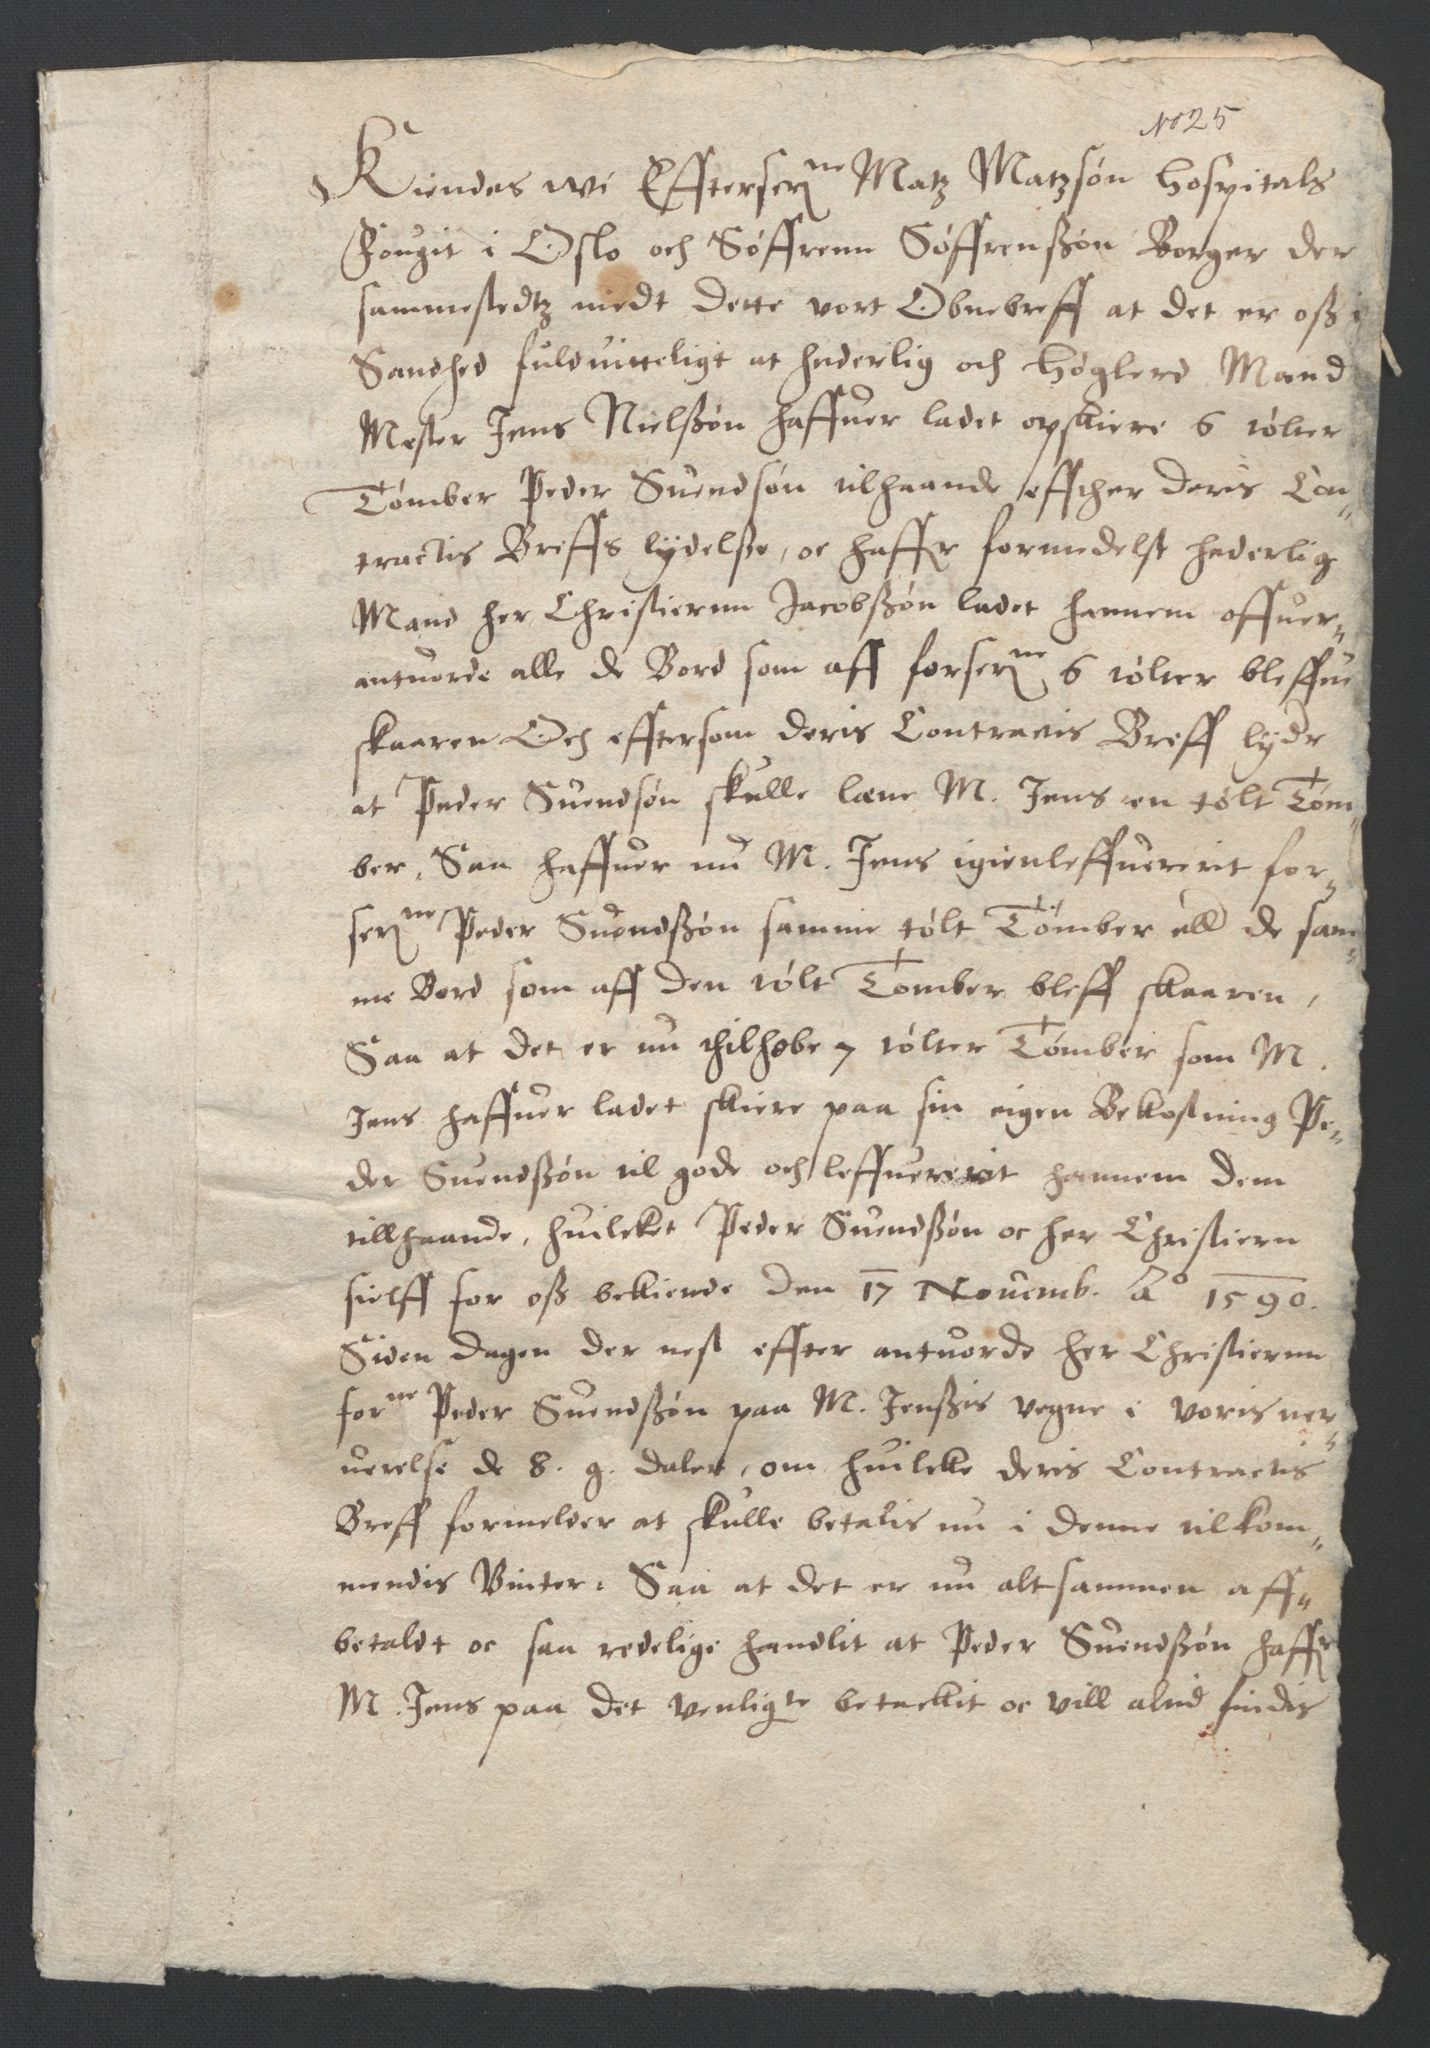 SAO, Oslo stiftsdireksjon, G/Gb/L0001: Bispestolens dokumenter, 1584-1612, s. 25